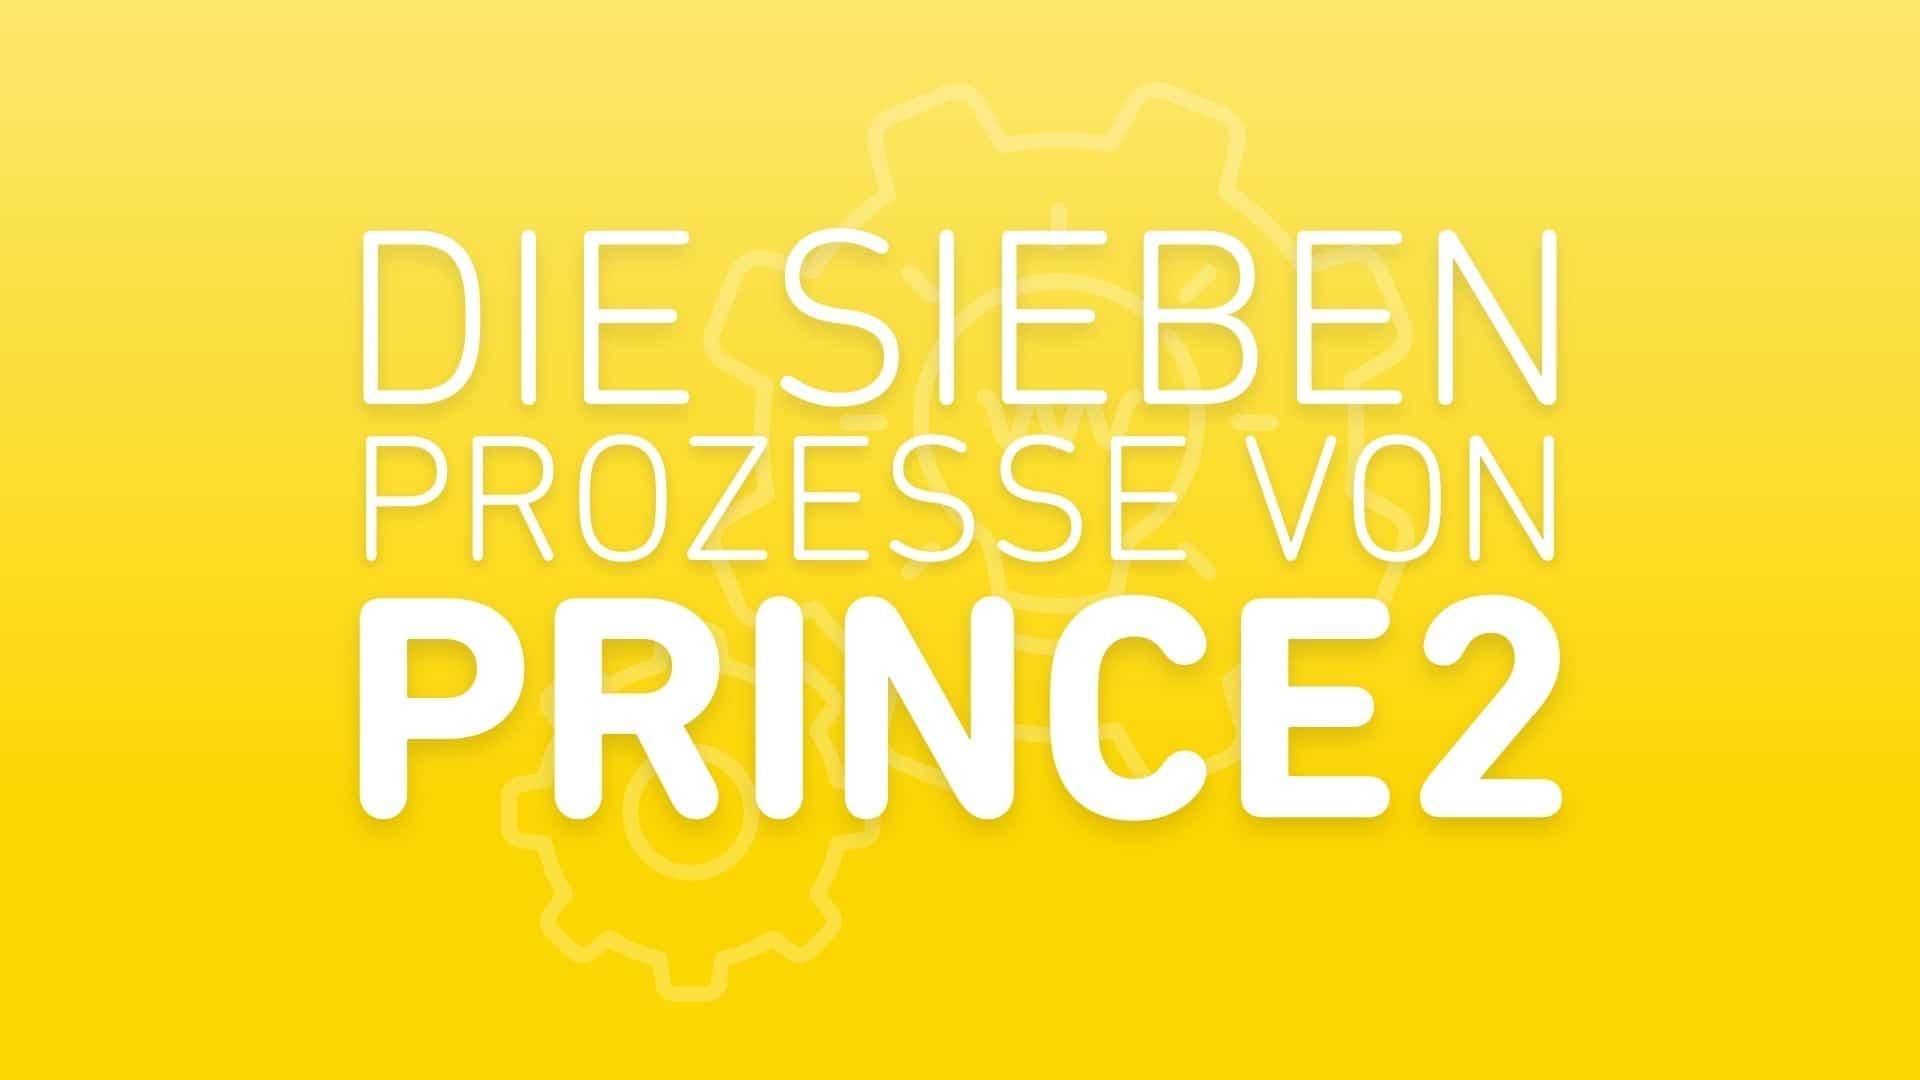 prince2-prozesse